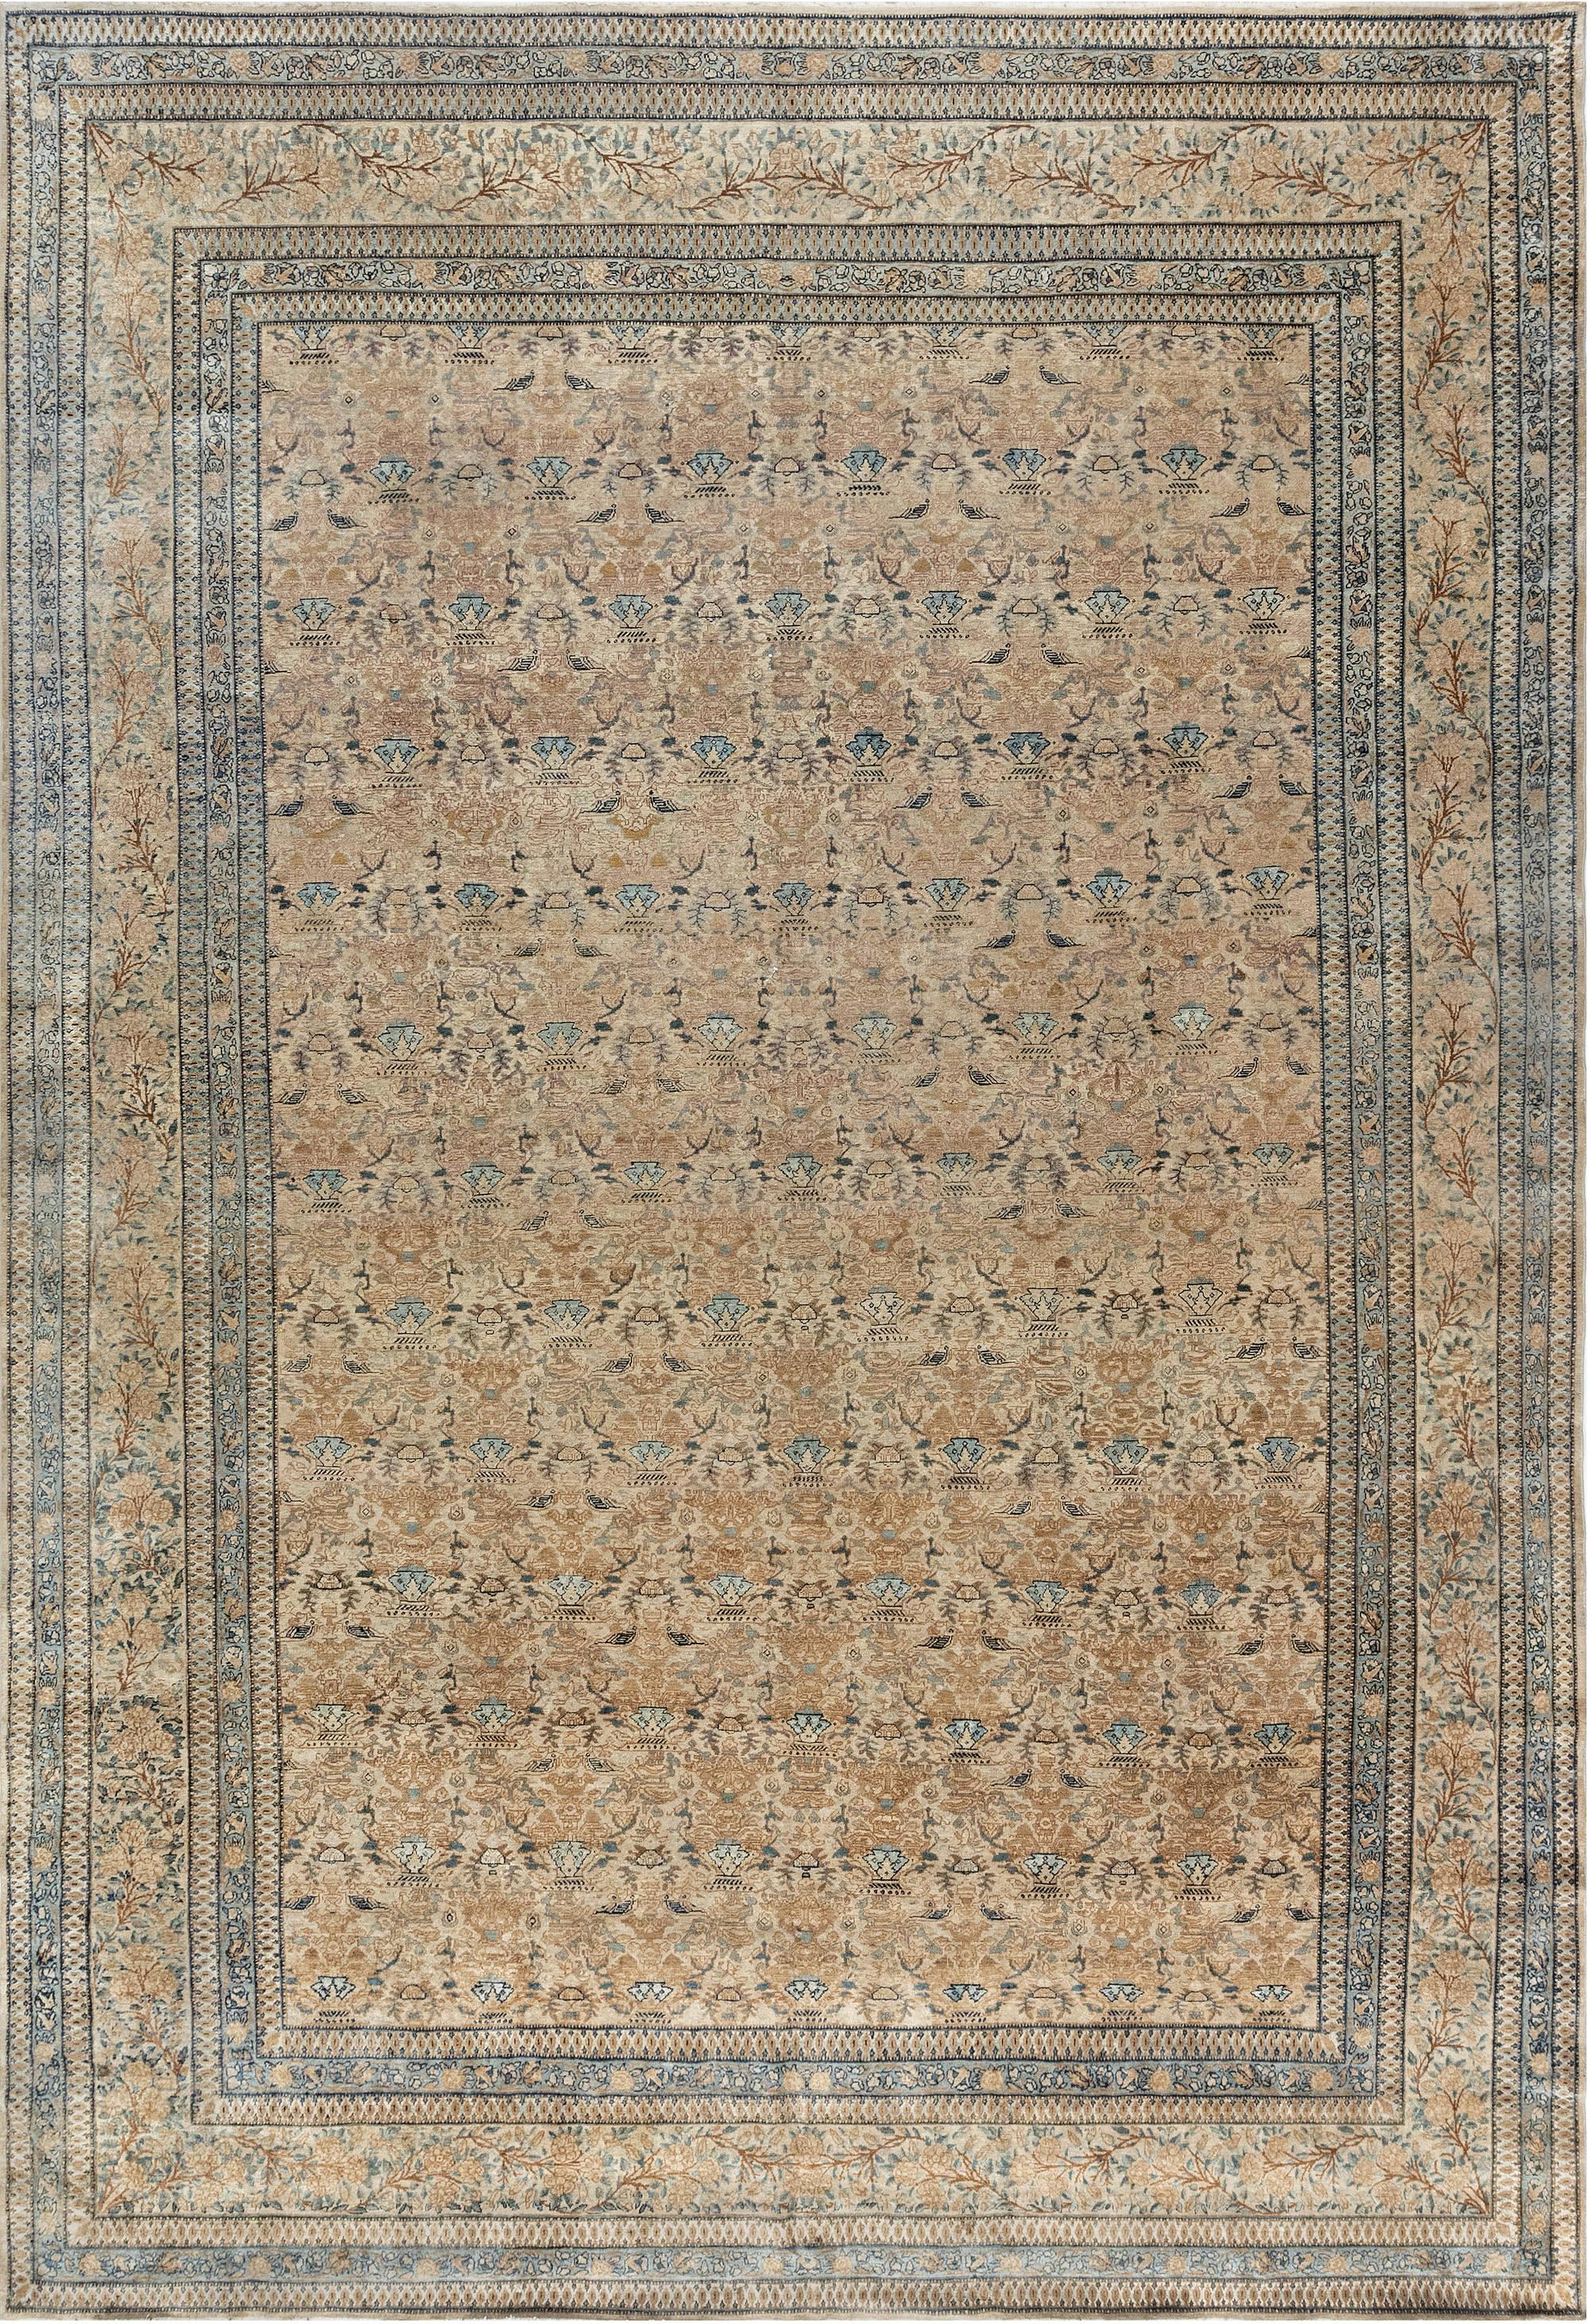 Antique Persian Kirman Carpet BB3970